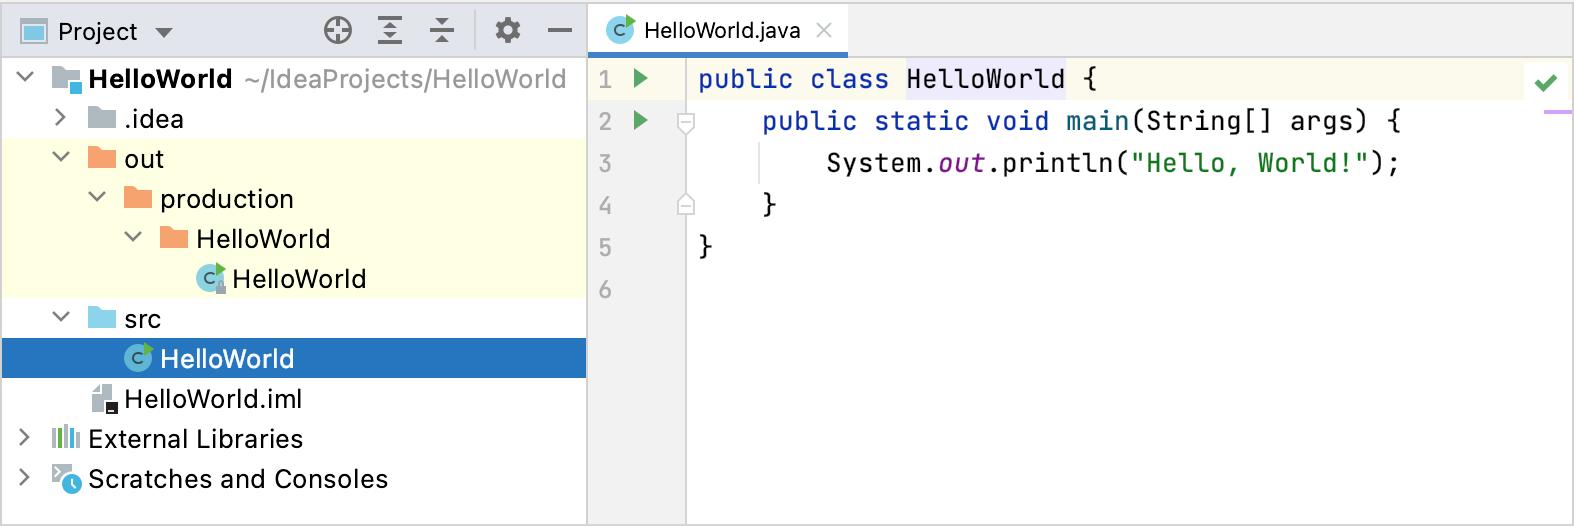 Sample Java application project